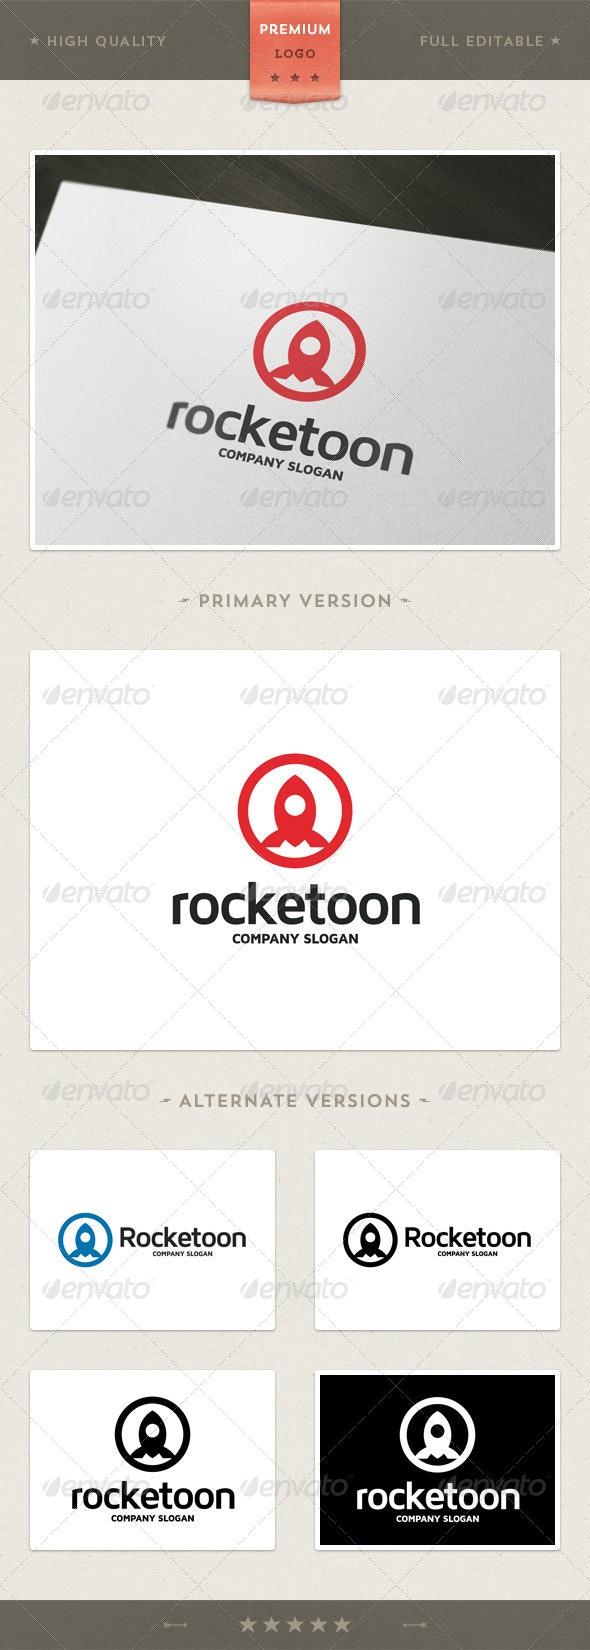 Rocketoon - Rocket Symbol Logo Template - Objects Logo Templates